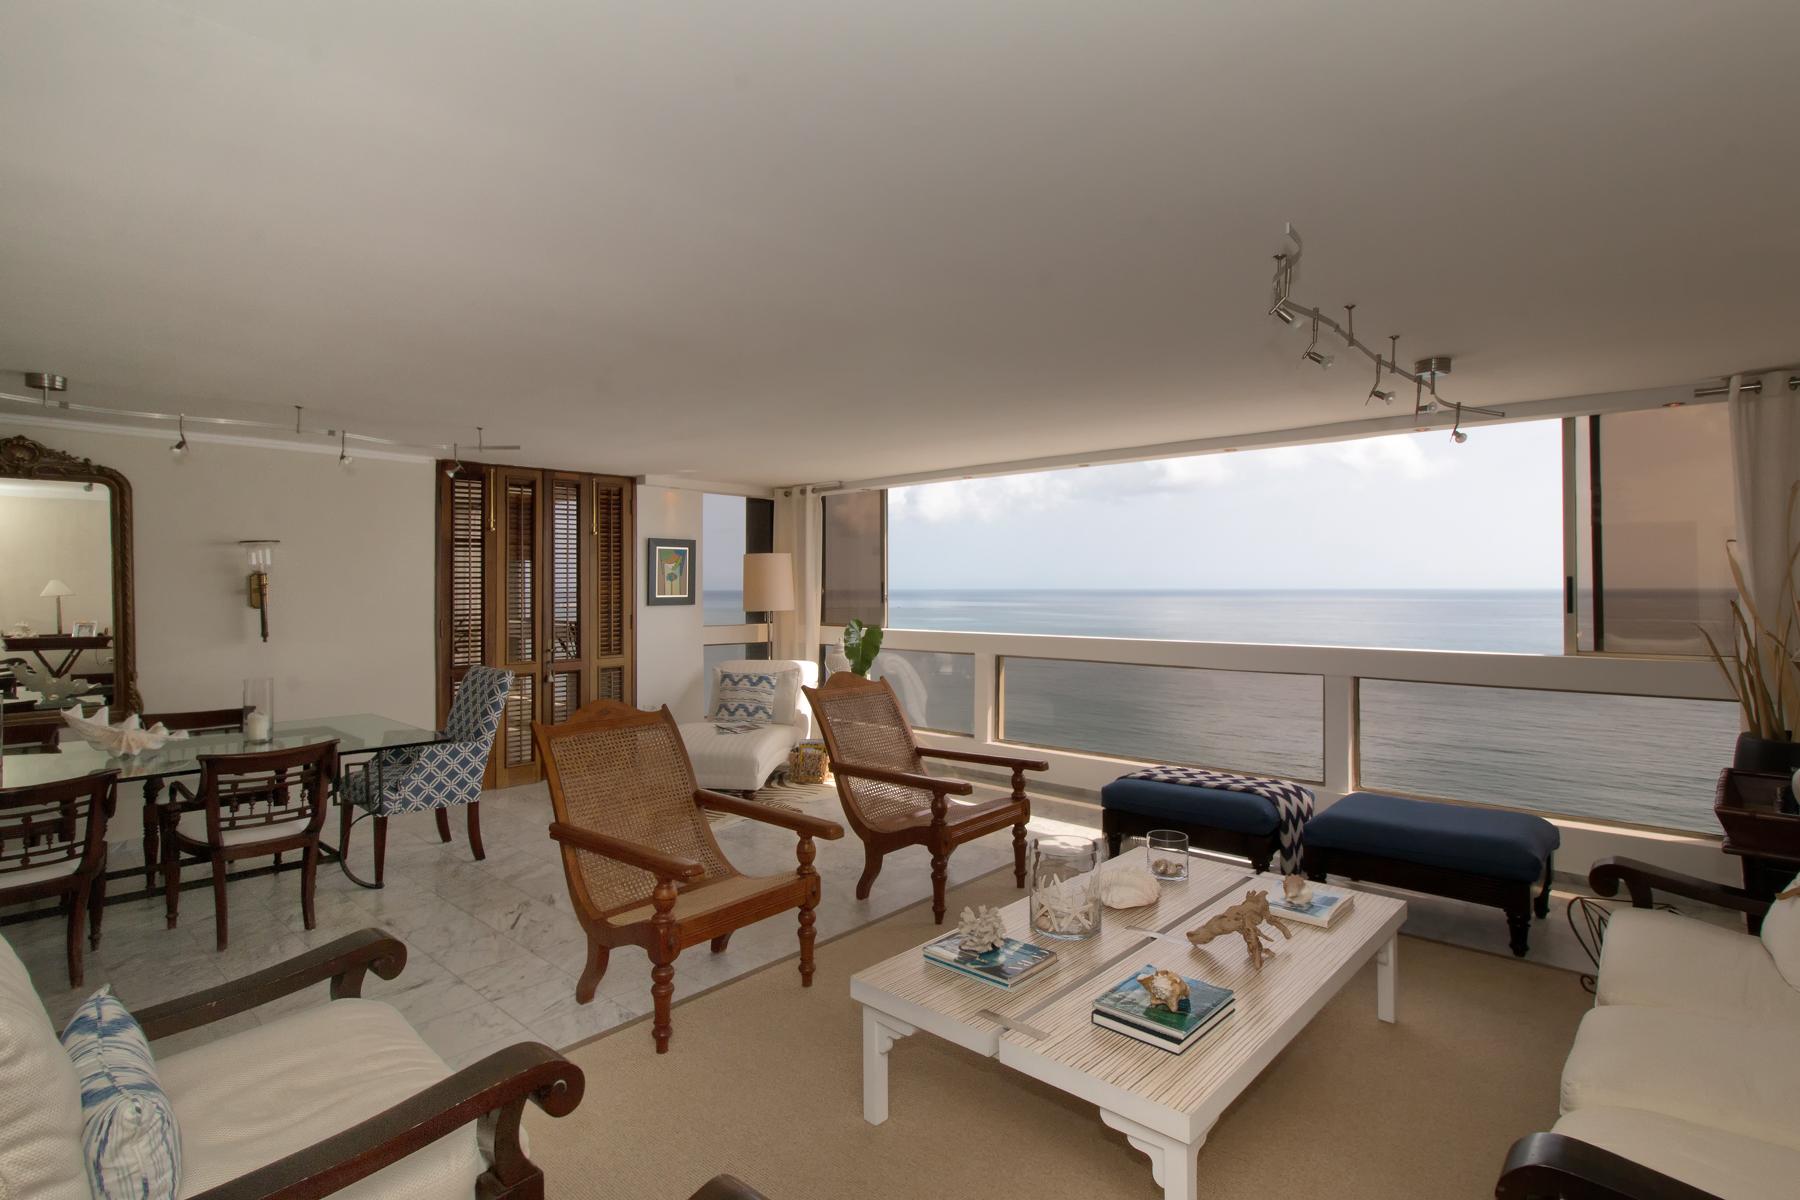 Additional photo for property listing at Oceanfront Penthouse on Isla Verde Beach 4531 Avenida Isla Verde Plaza Atlantico Condominium Carolina, Puerto Rico 00979 Puerto Rico